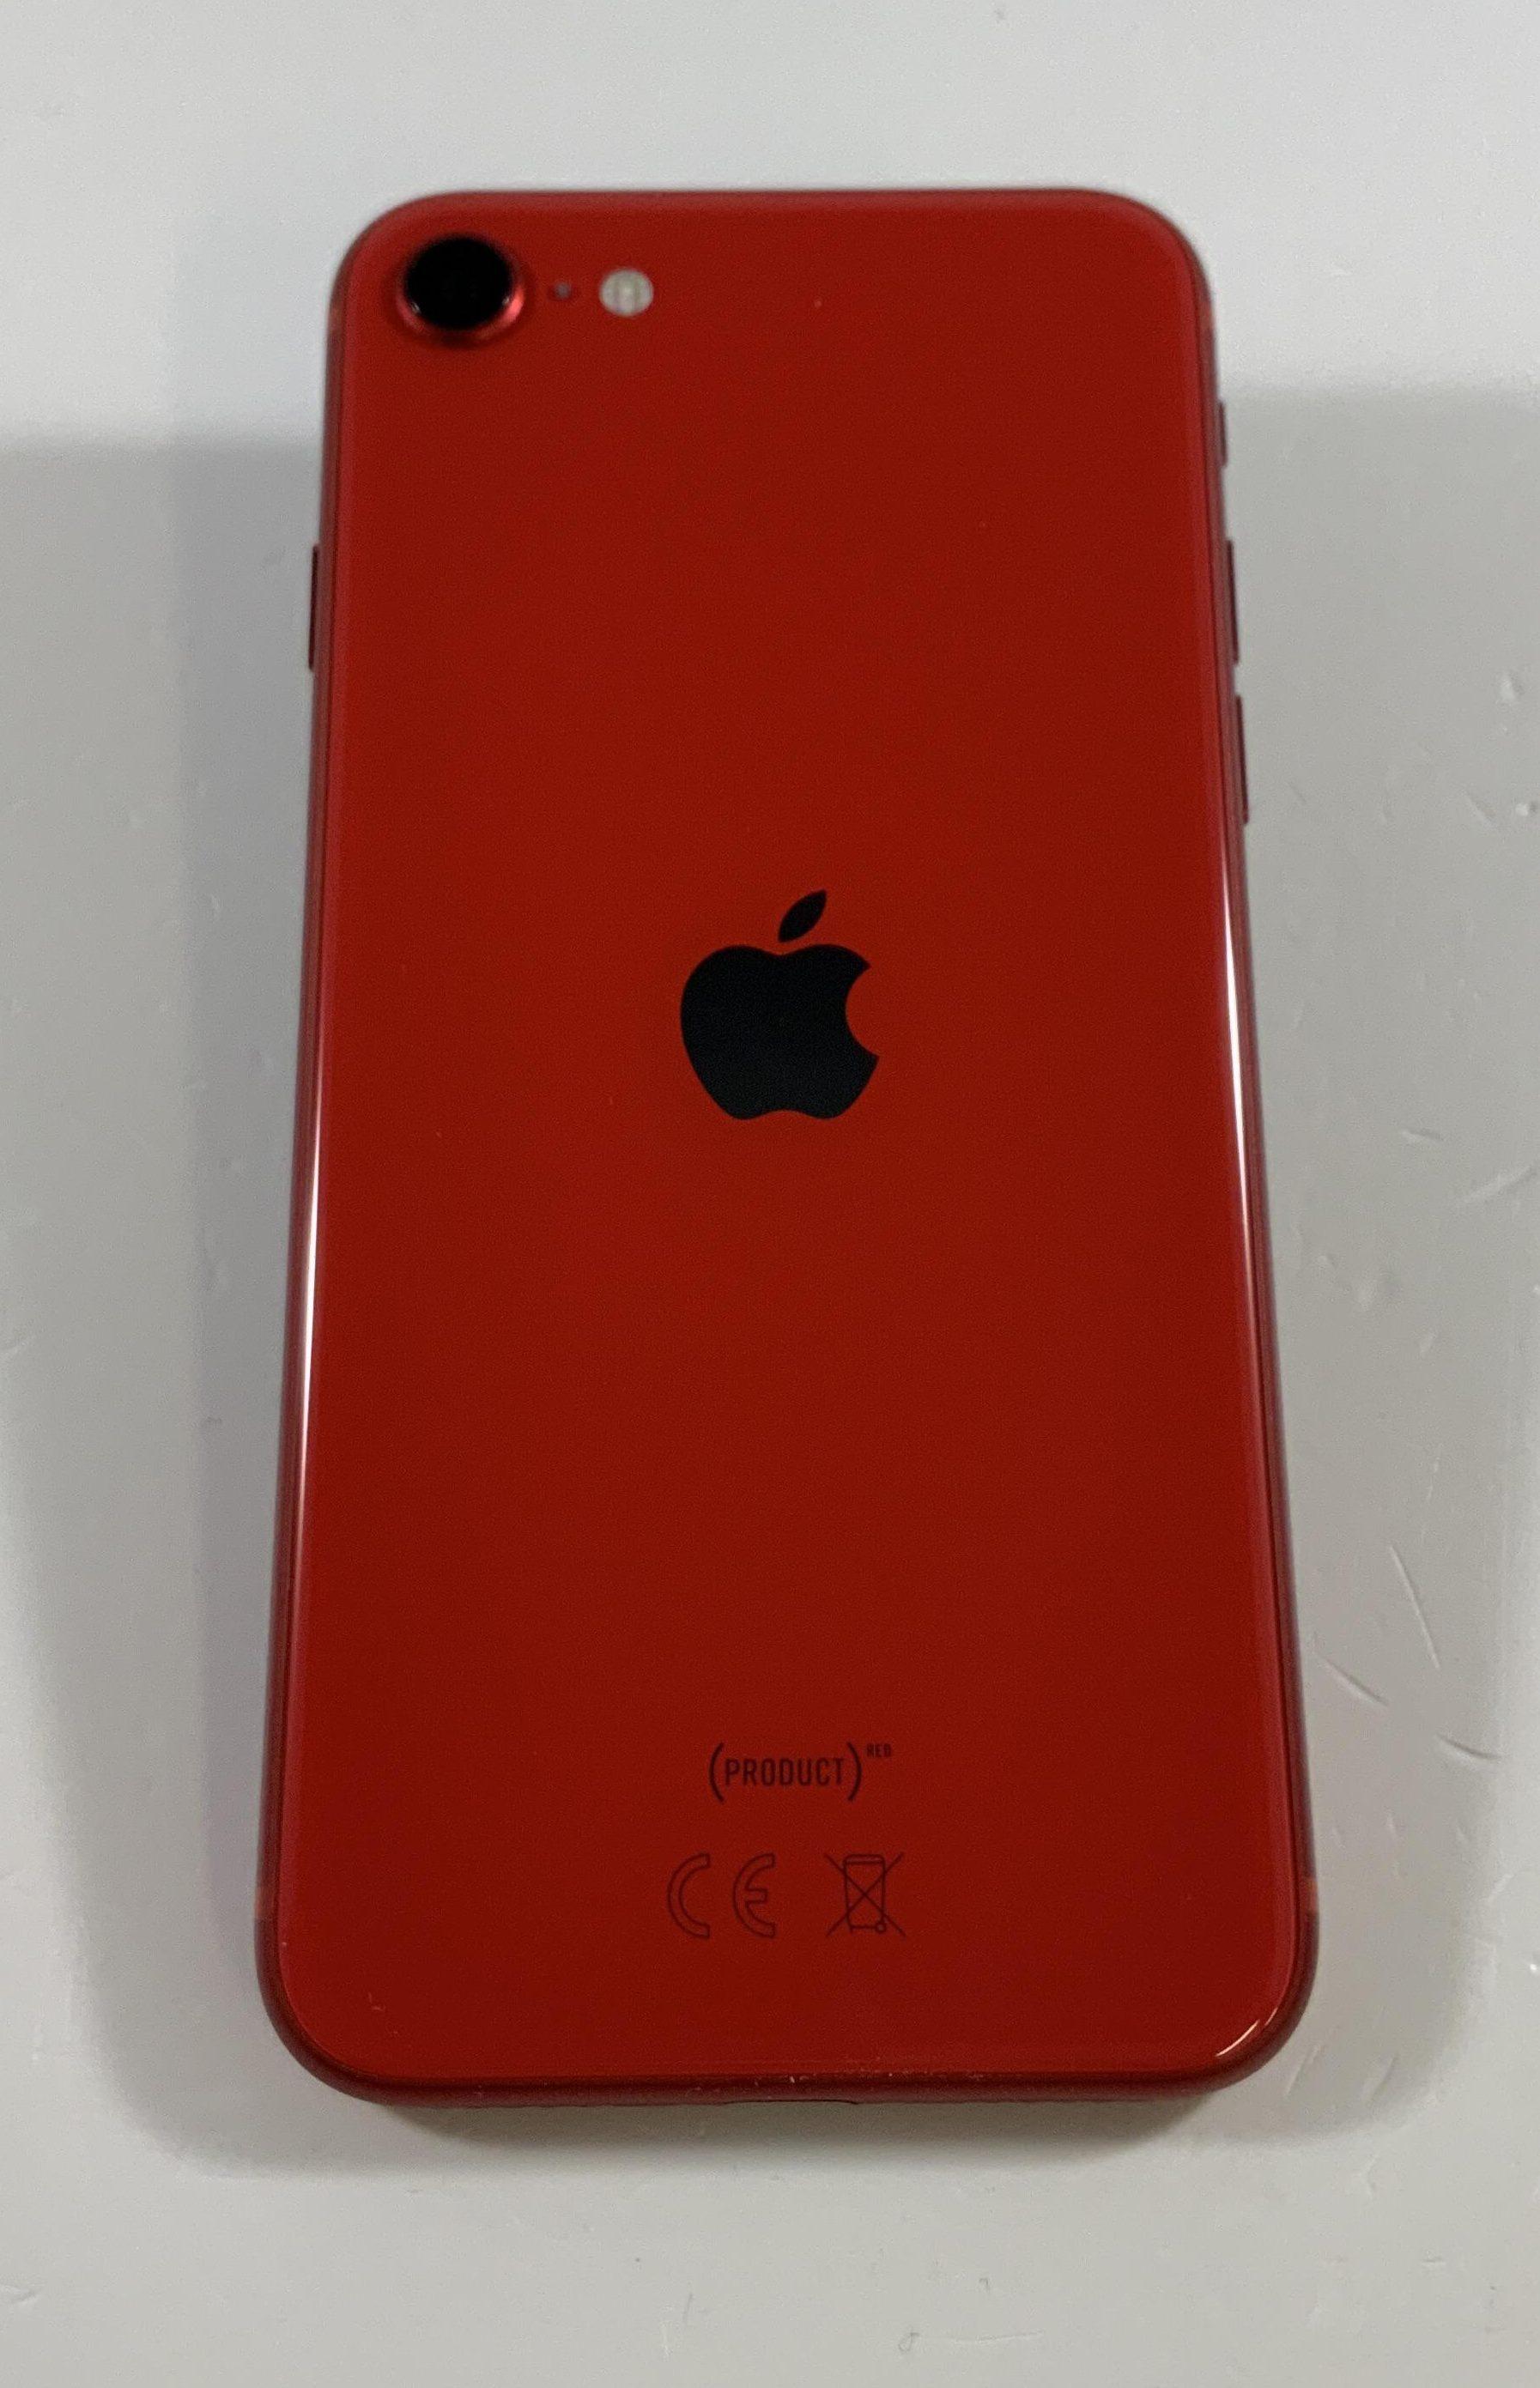 iPhone SE (2nd Gen) 64GB, 64GB, Red, imagen 2